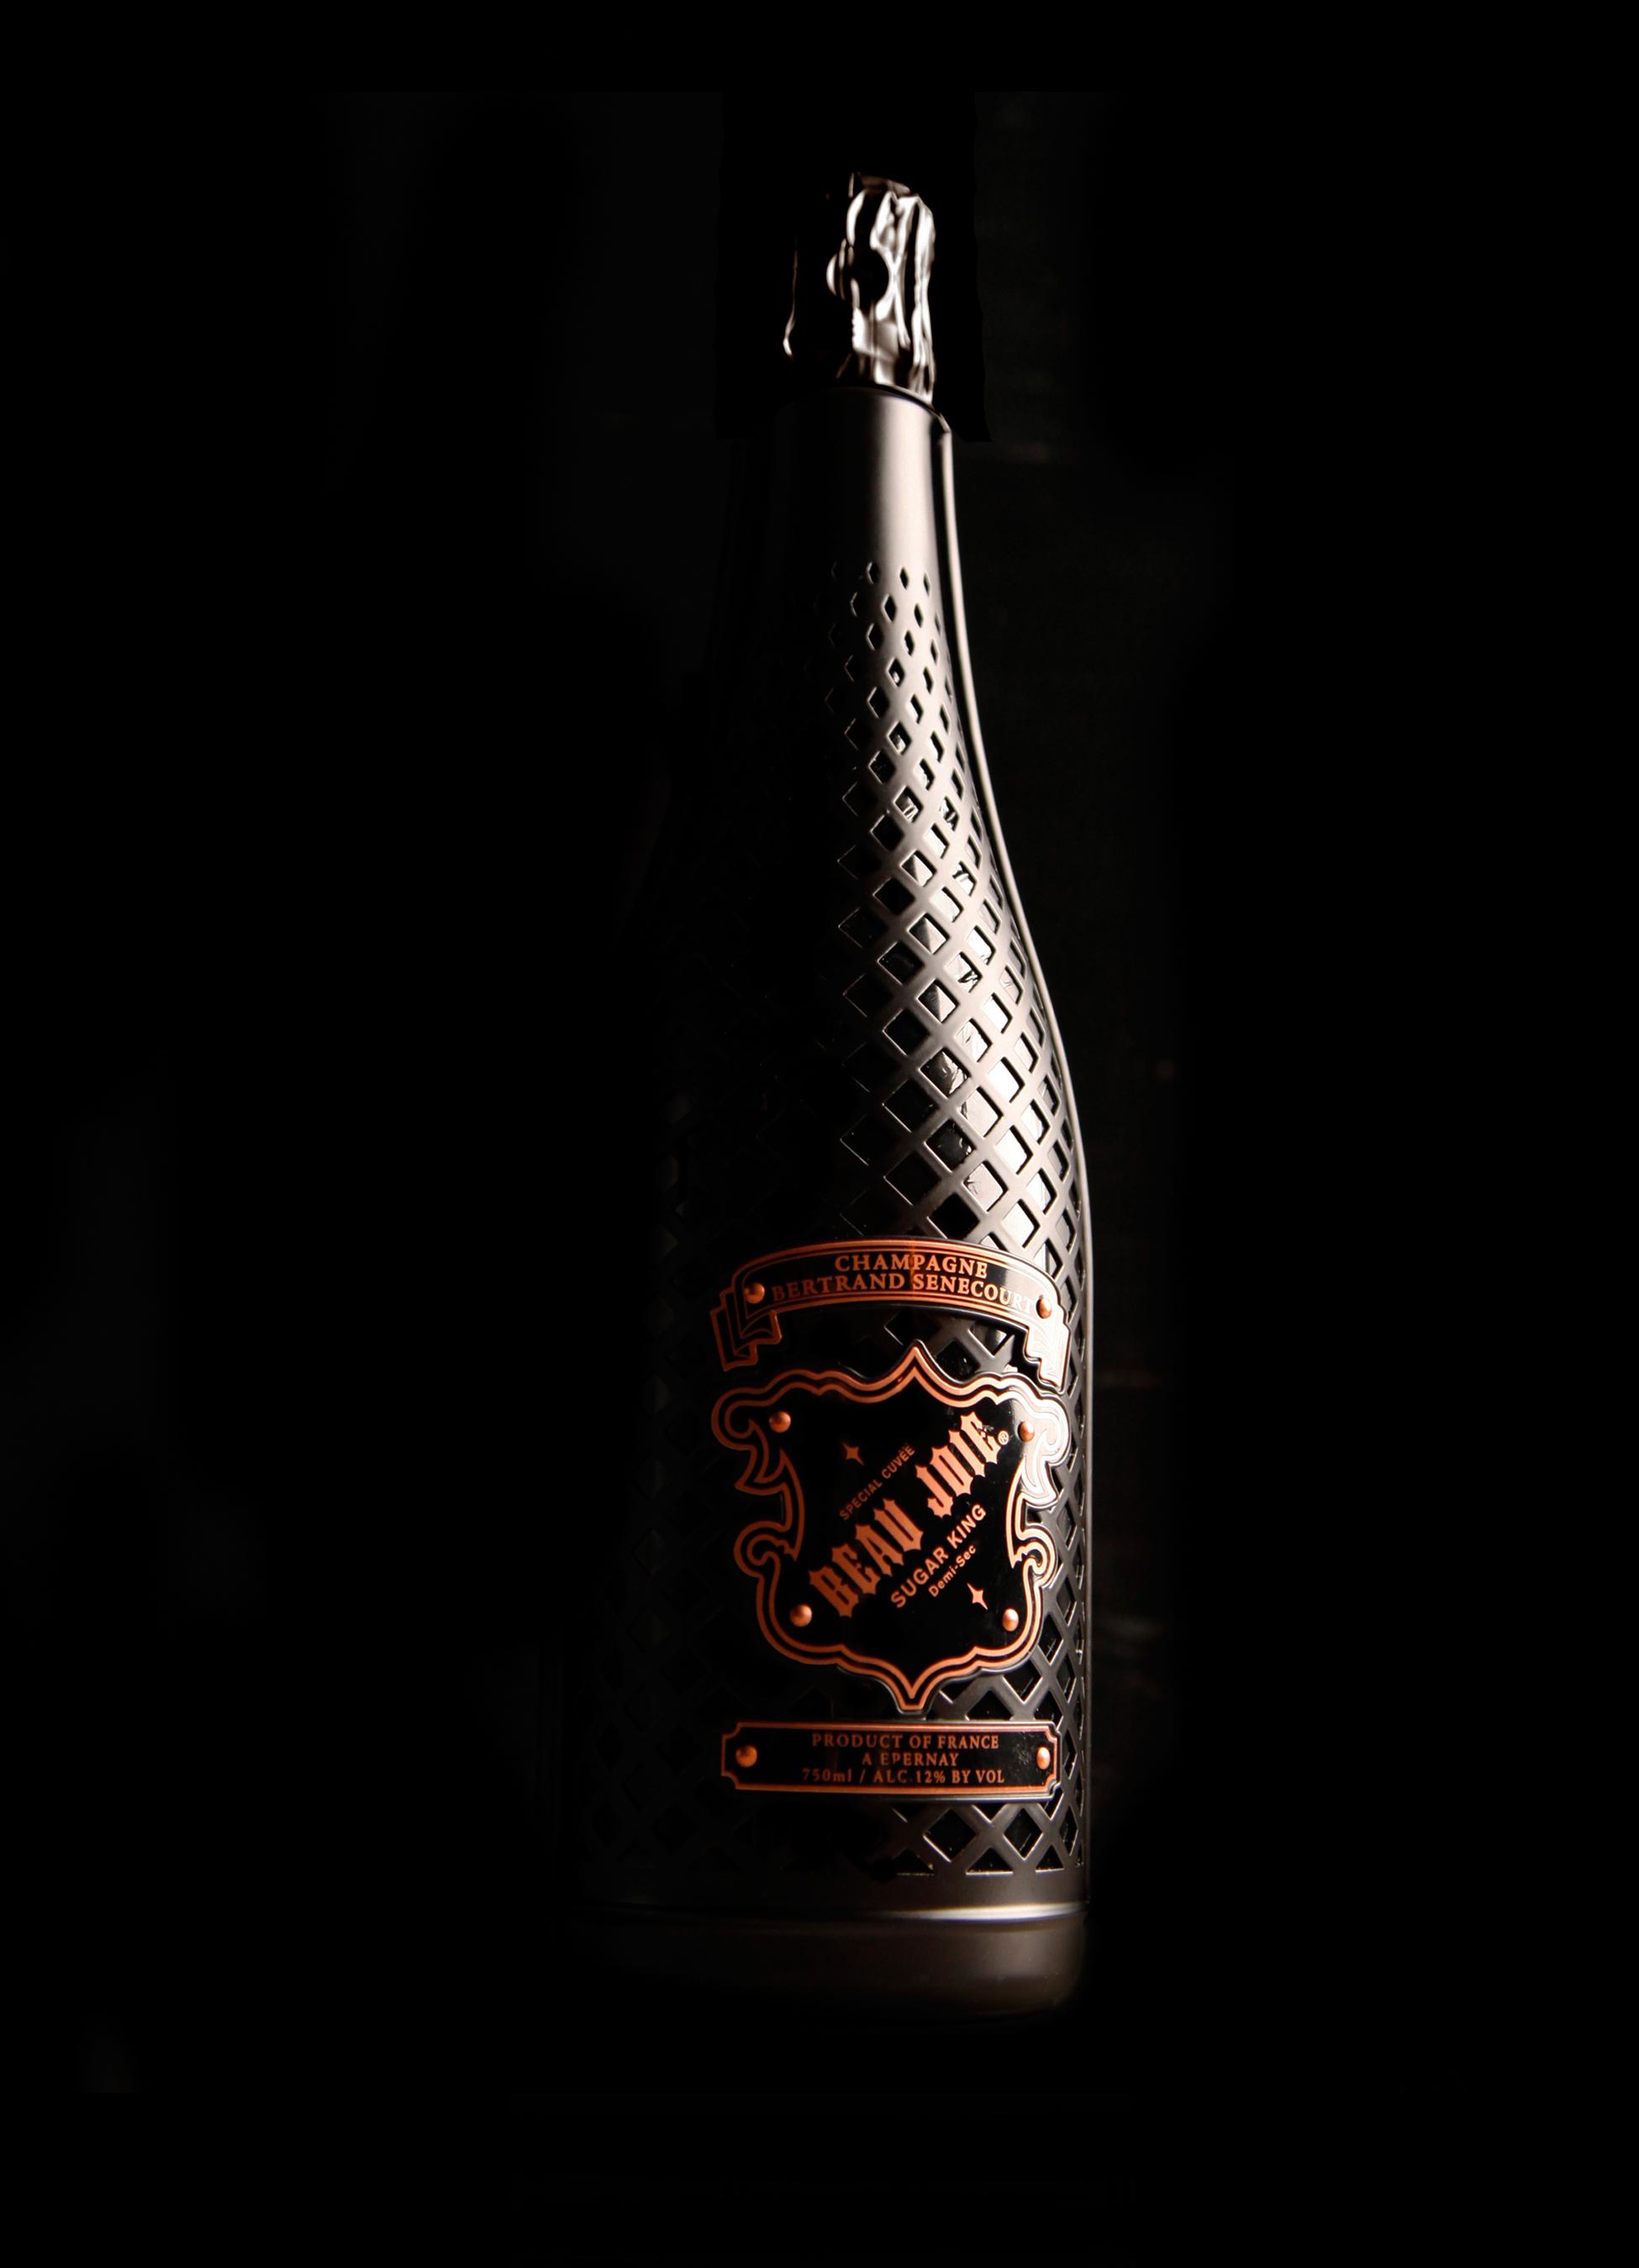 champagne_3.jpg